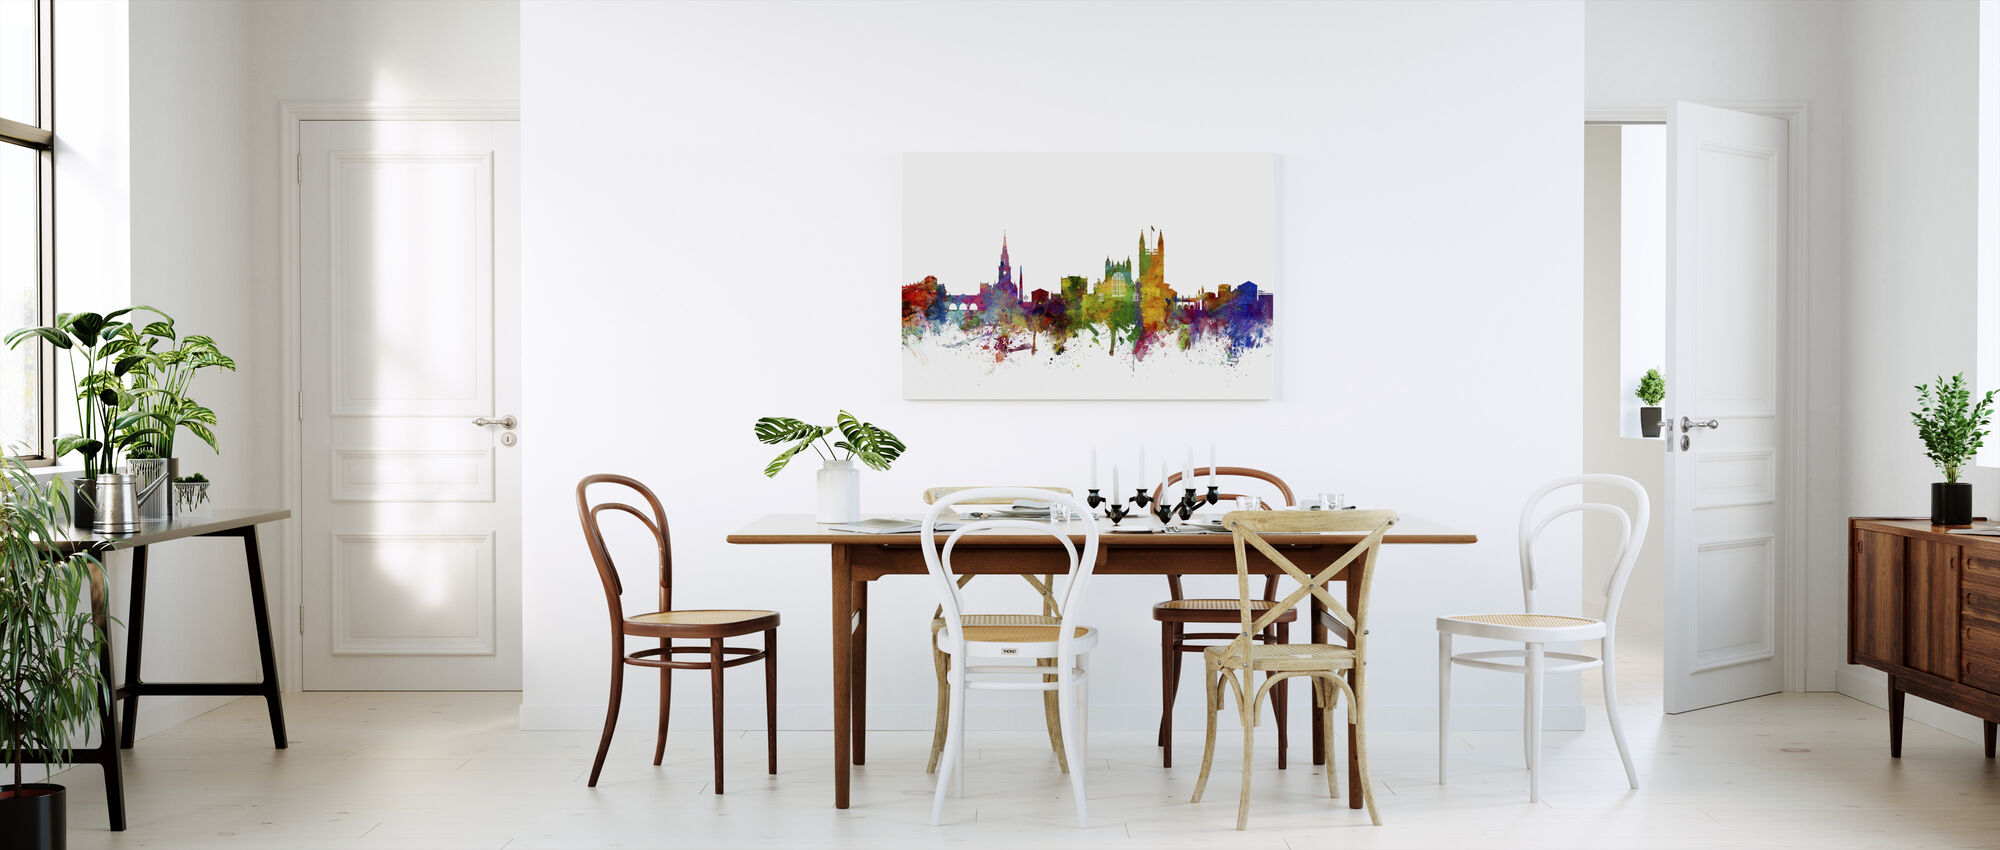 Bath England Skyline - Canvas print - Kitchen